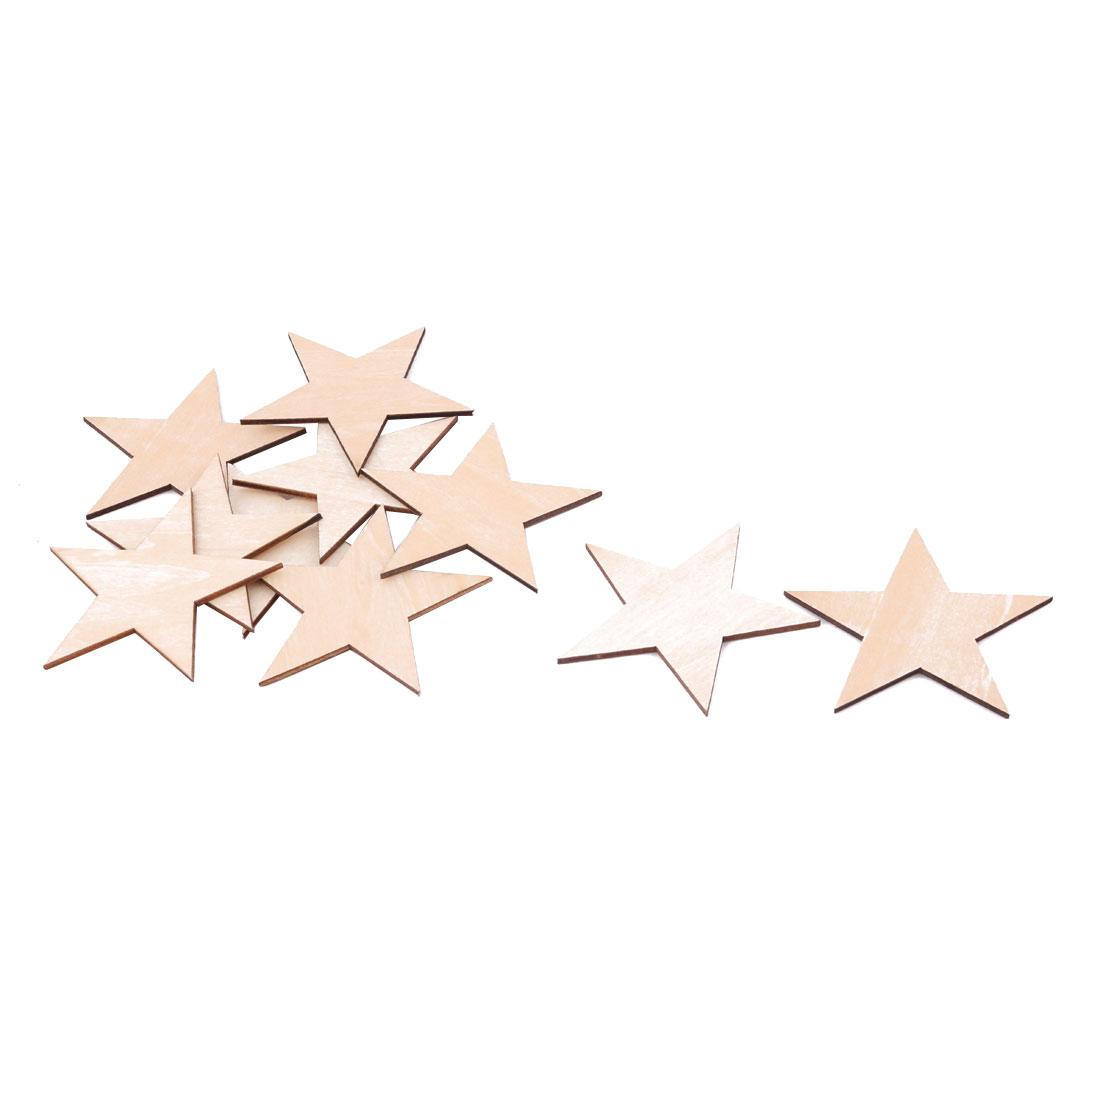 Wooden Star Shaped DIY Craft Christmas Tree Accessories Ornaments Beige 80 x 80mm 10pcs